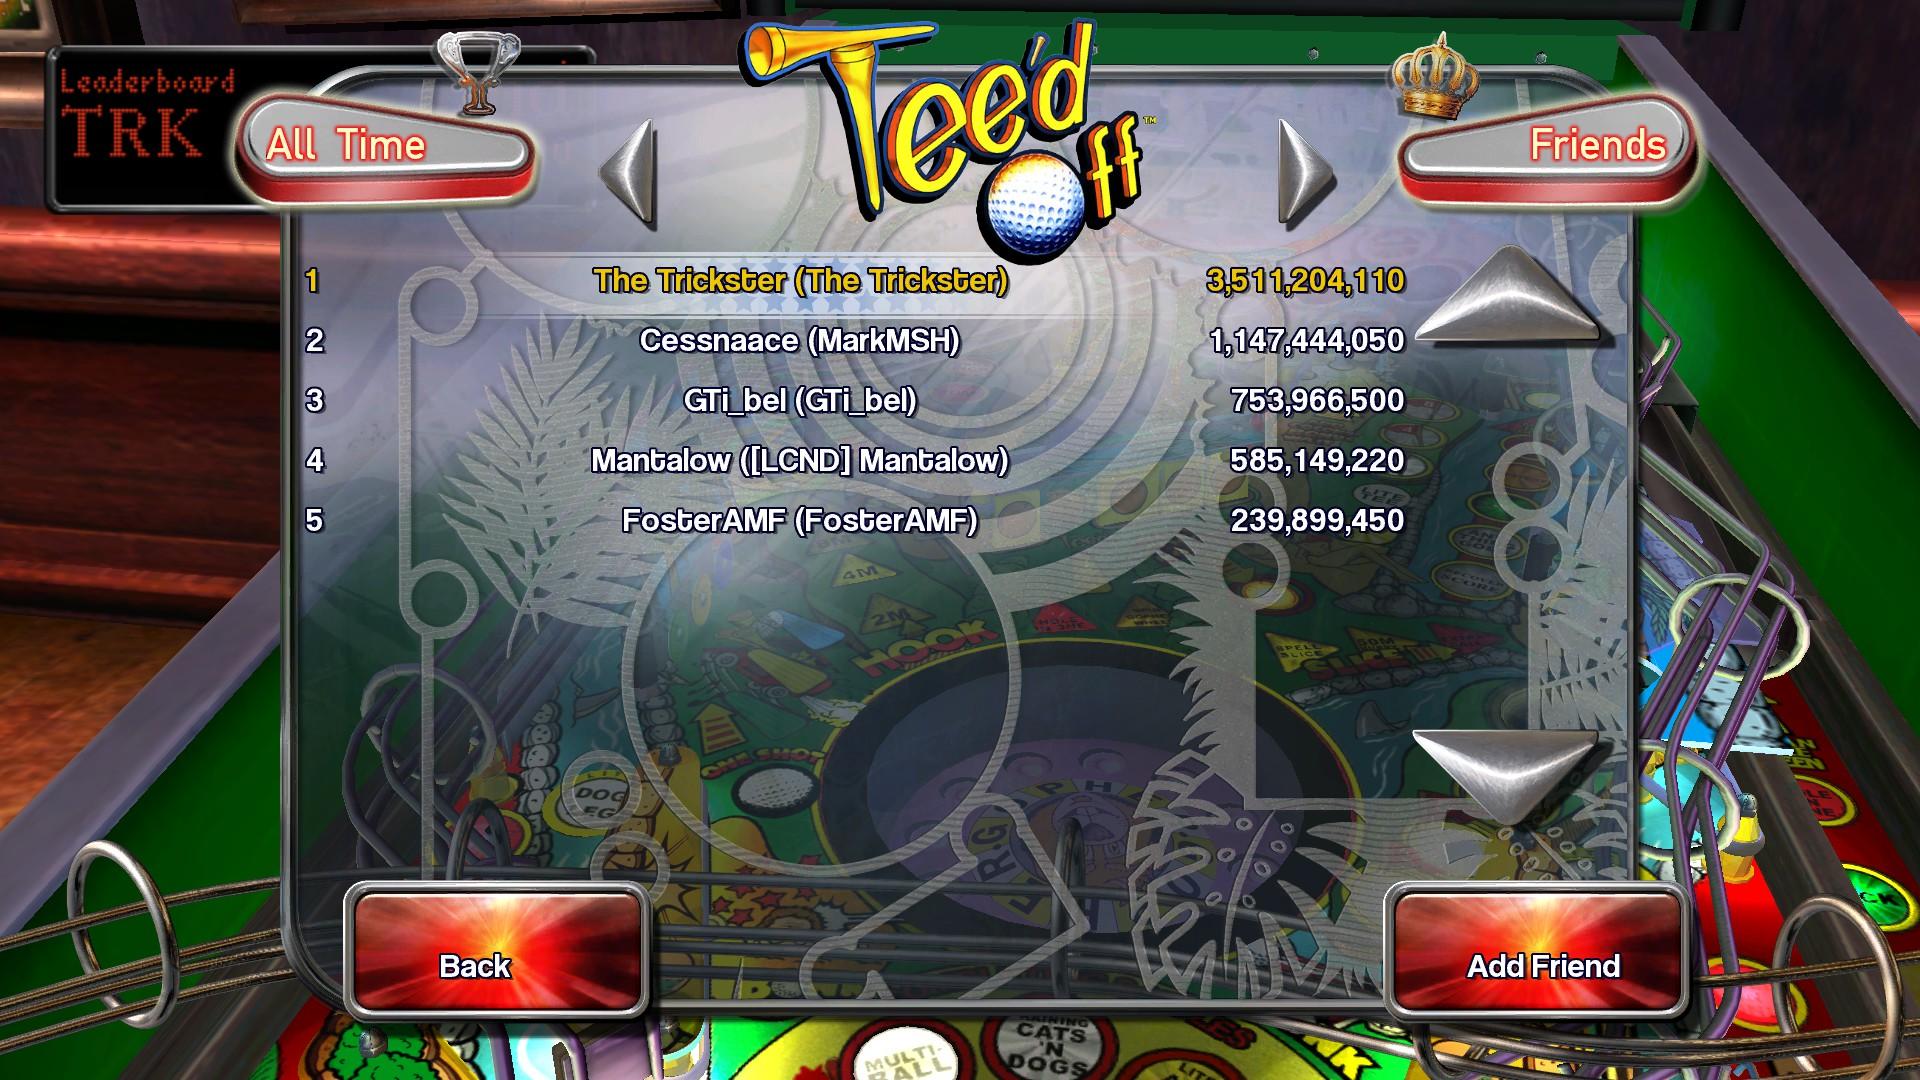 Pinball Arcade: Tee